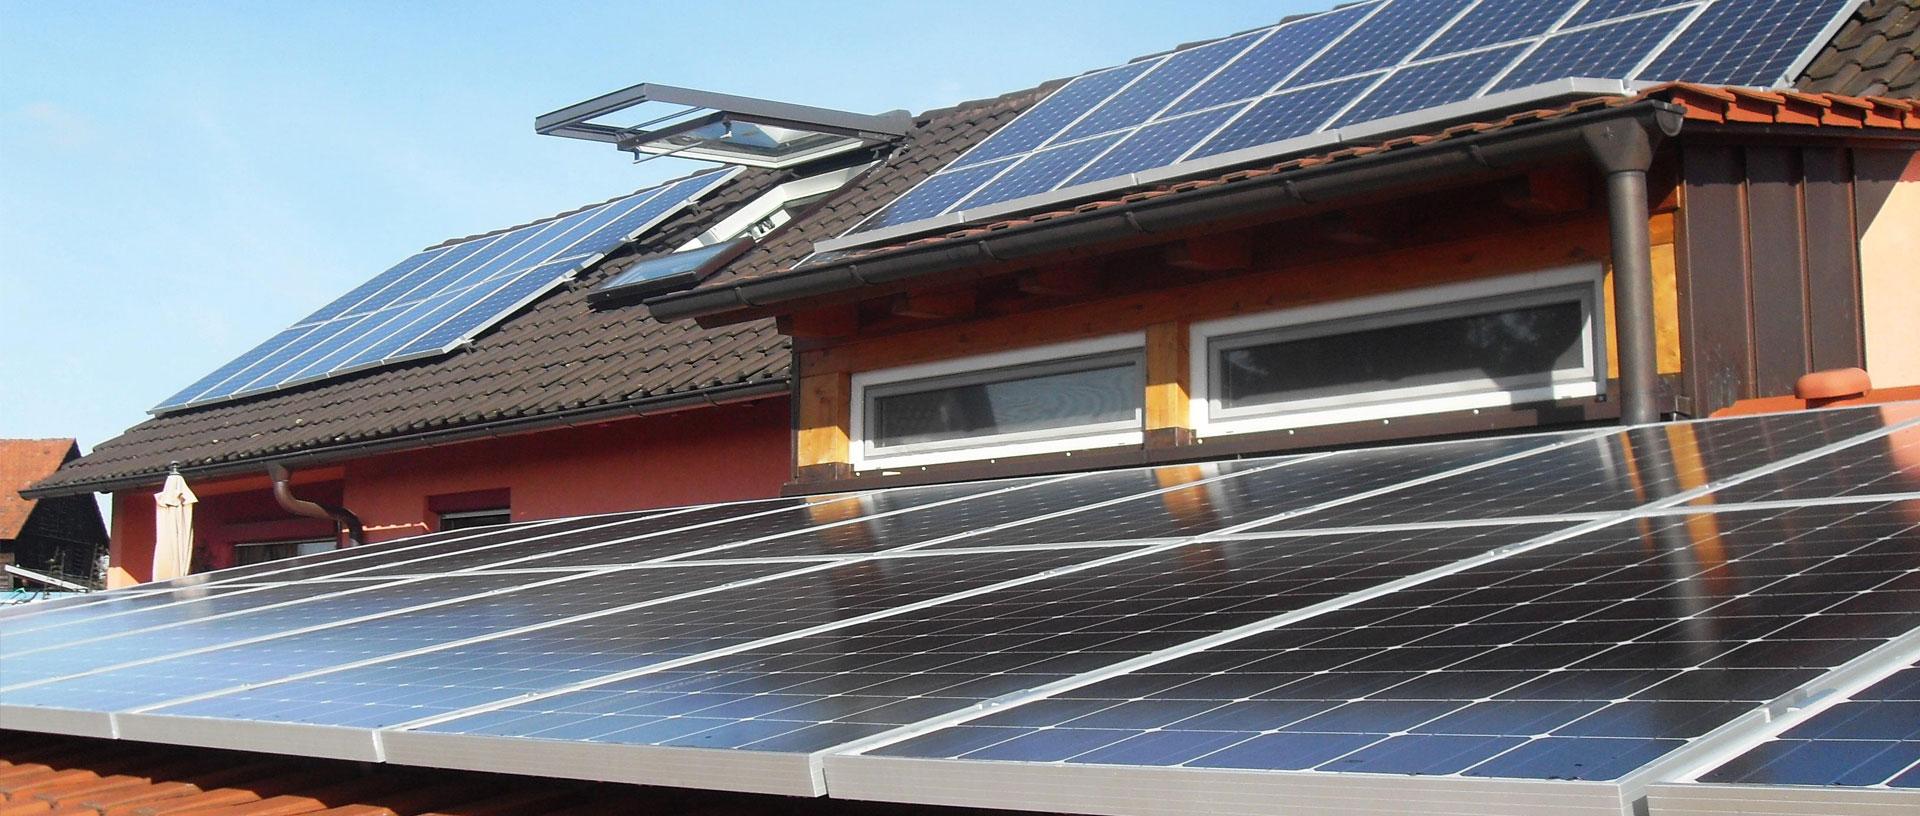 photovoltaic power generation